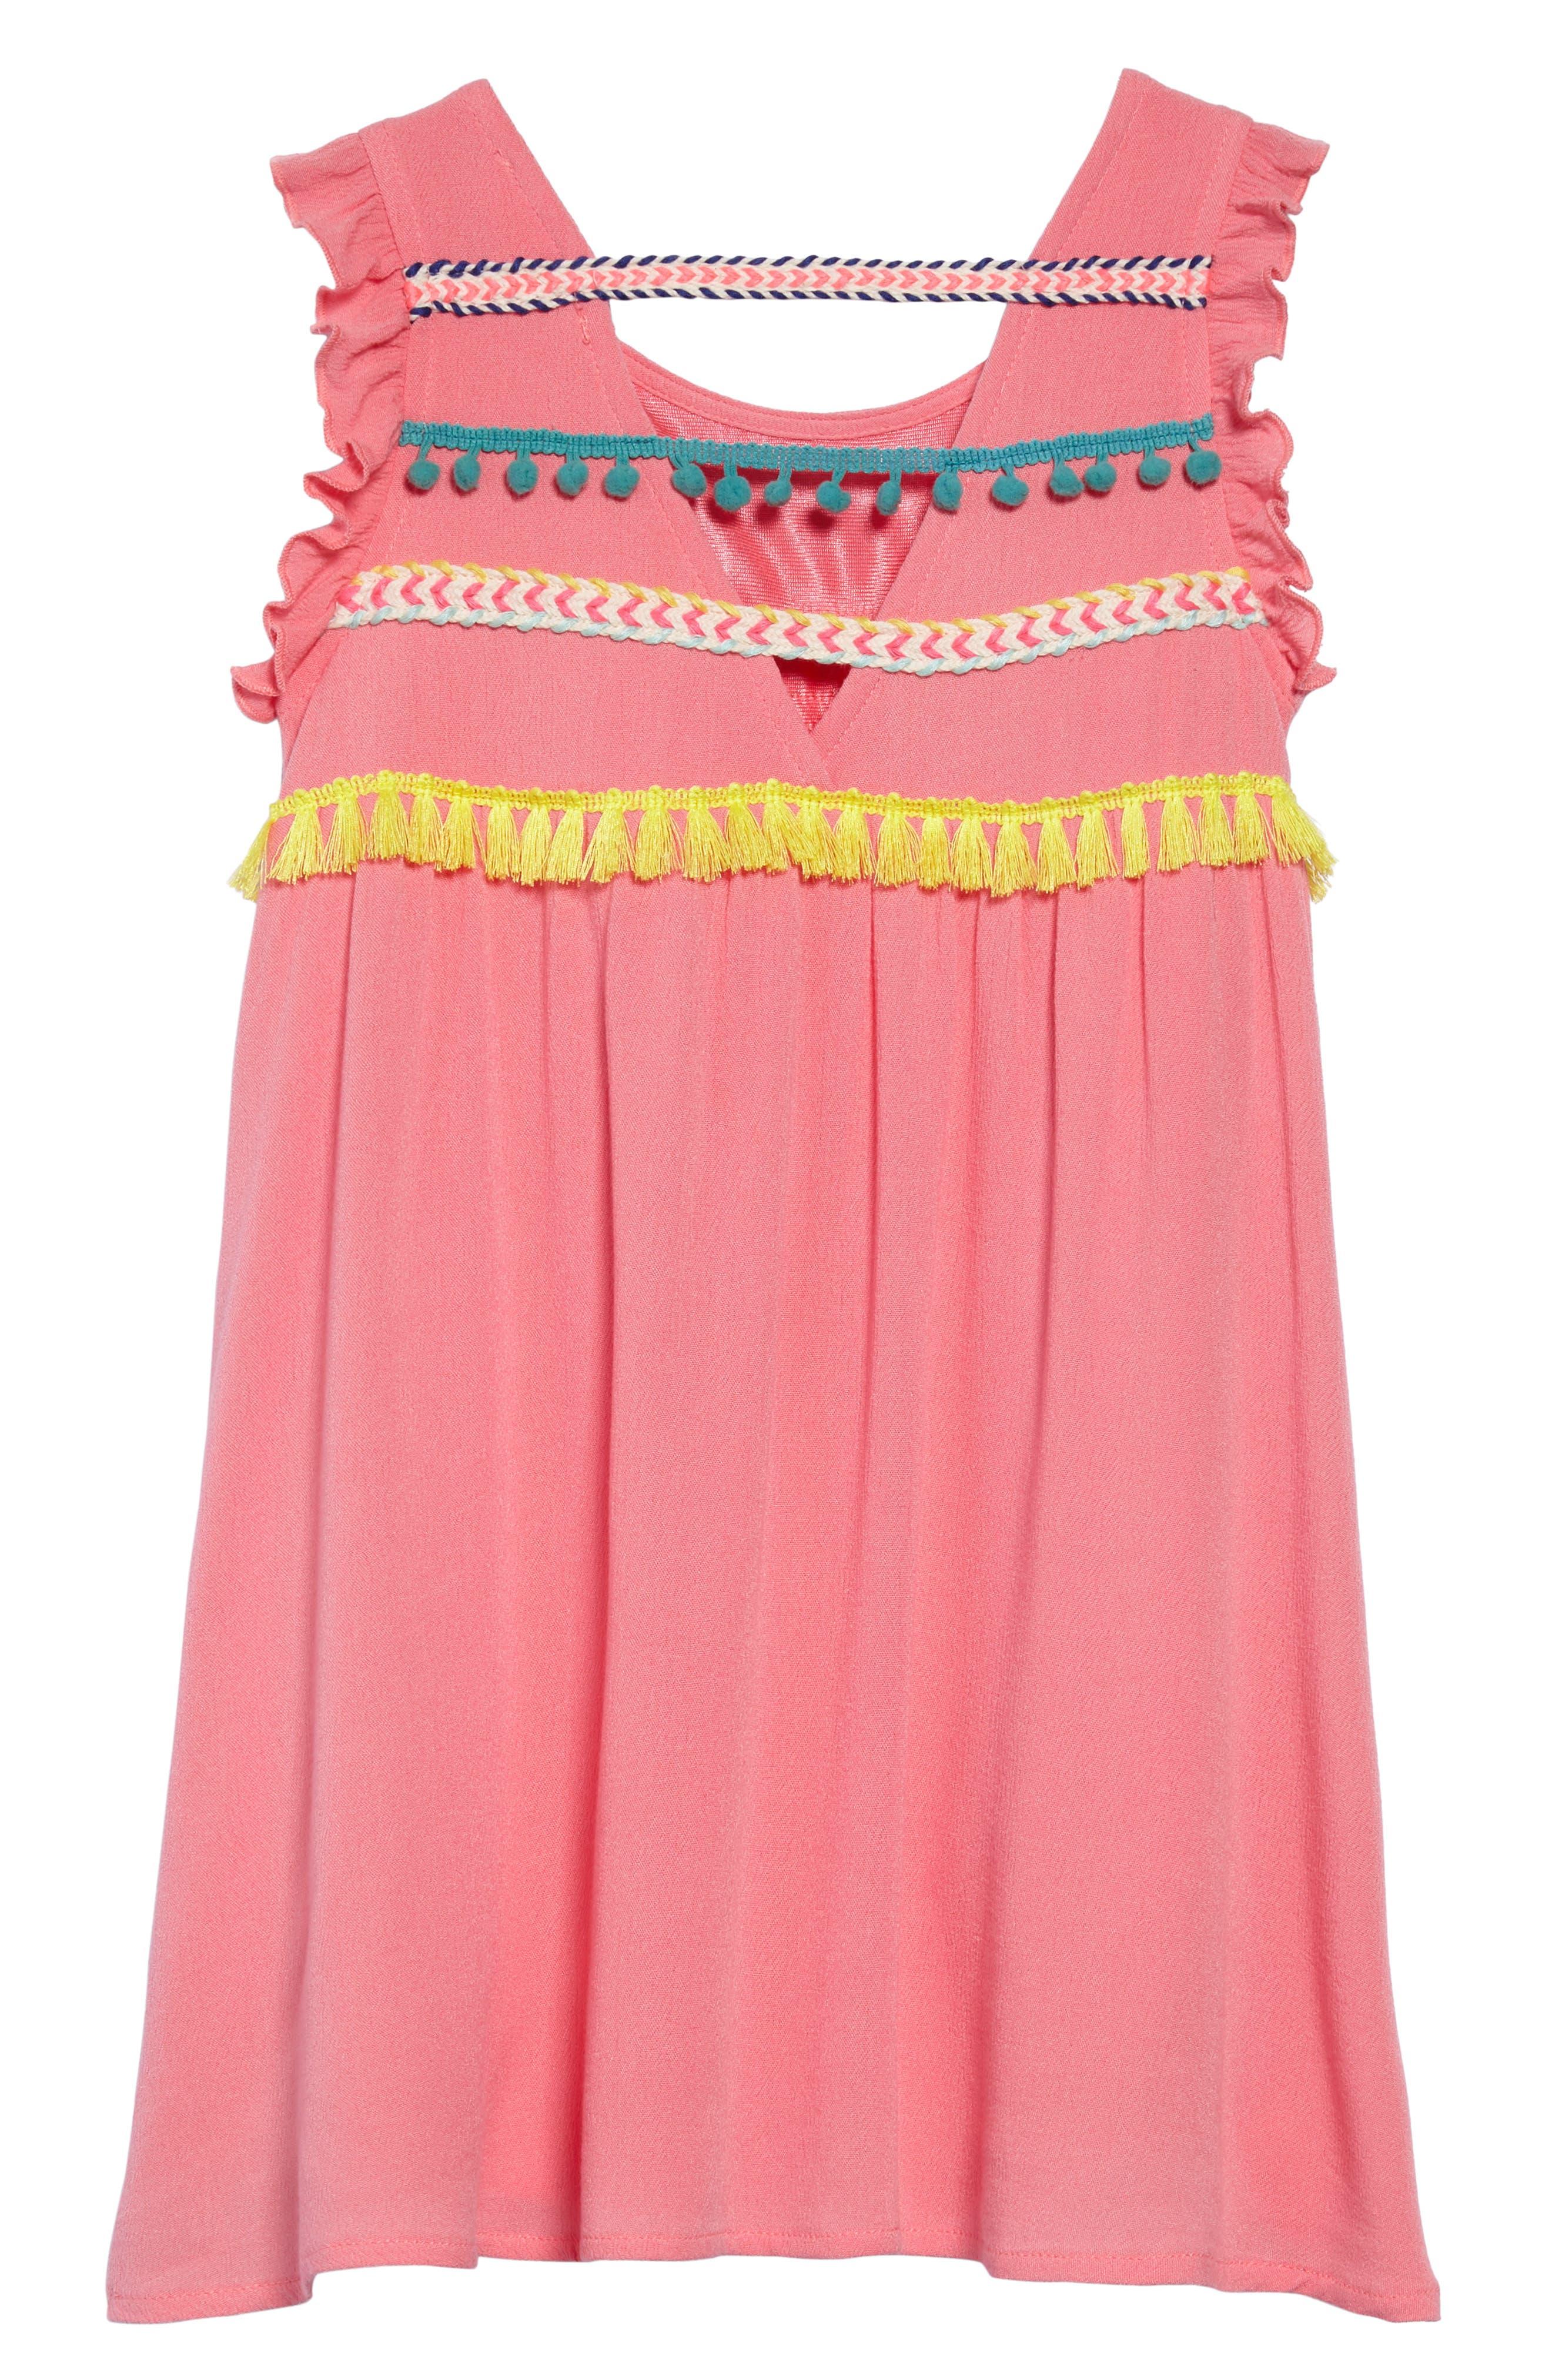 Trim Babydoll Dress,                             Alternate thumbnail 2, color,                             Coral